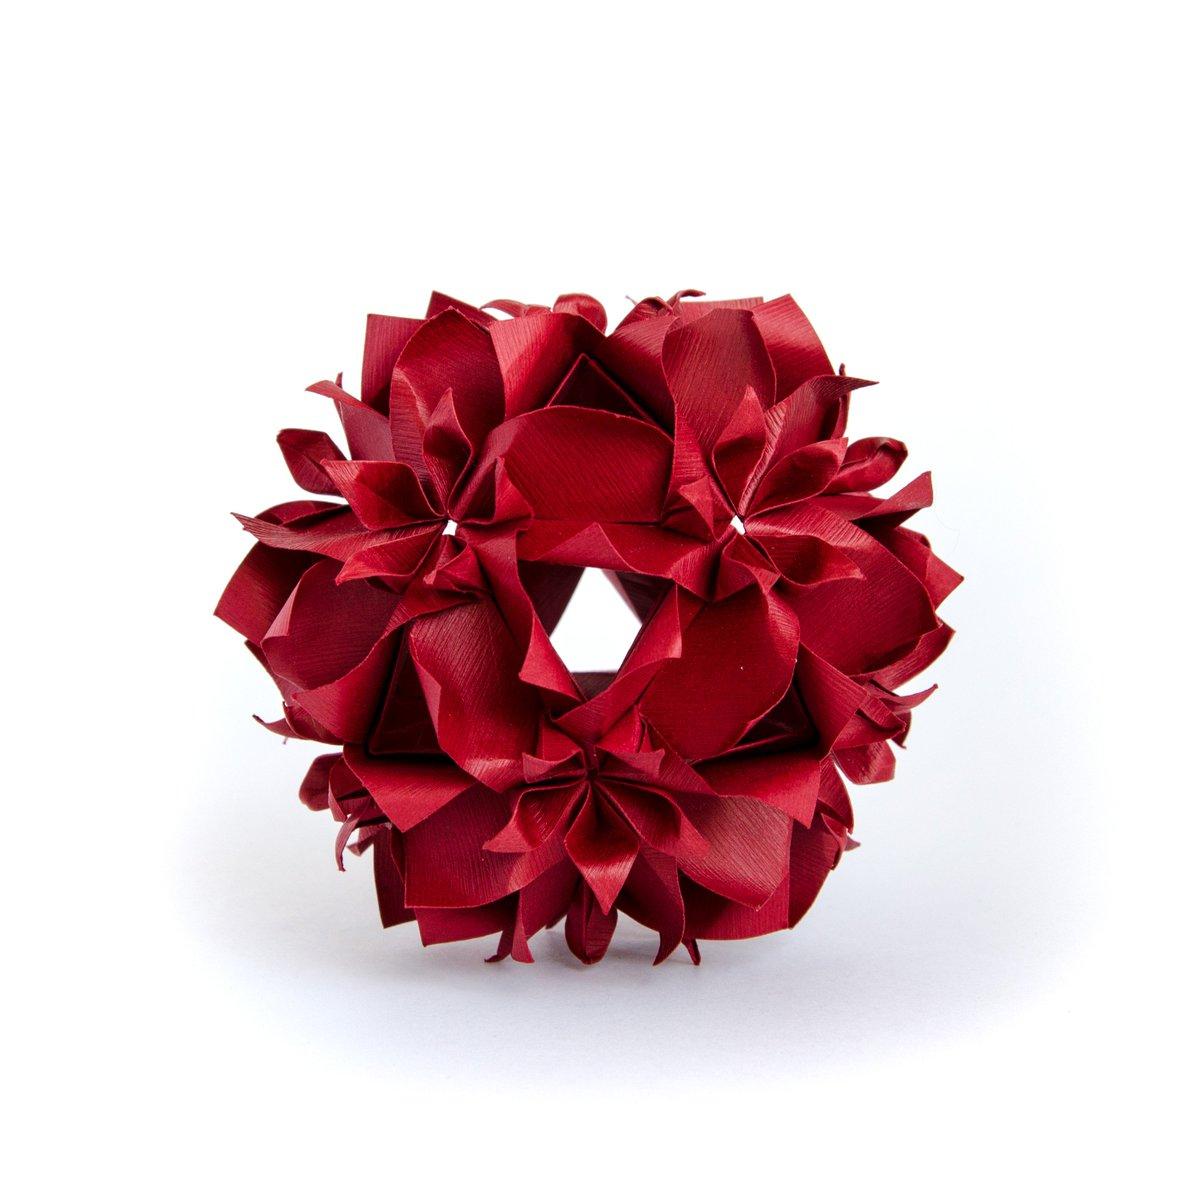 Fuse: Kawaii Hana no Kusudama Origami, 17,47 € | 1200x1200